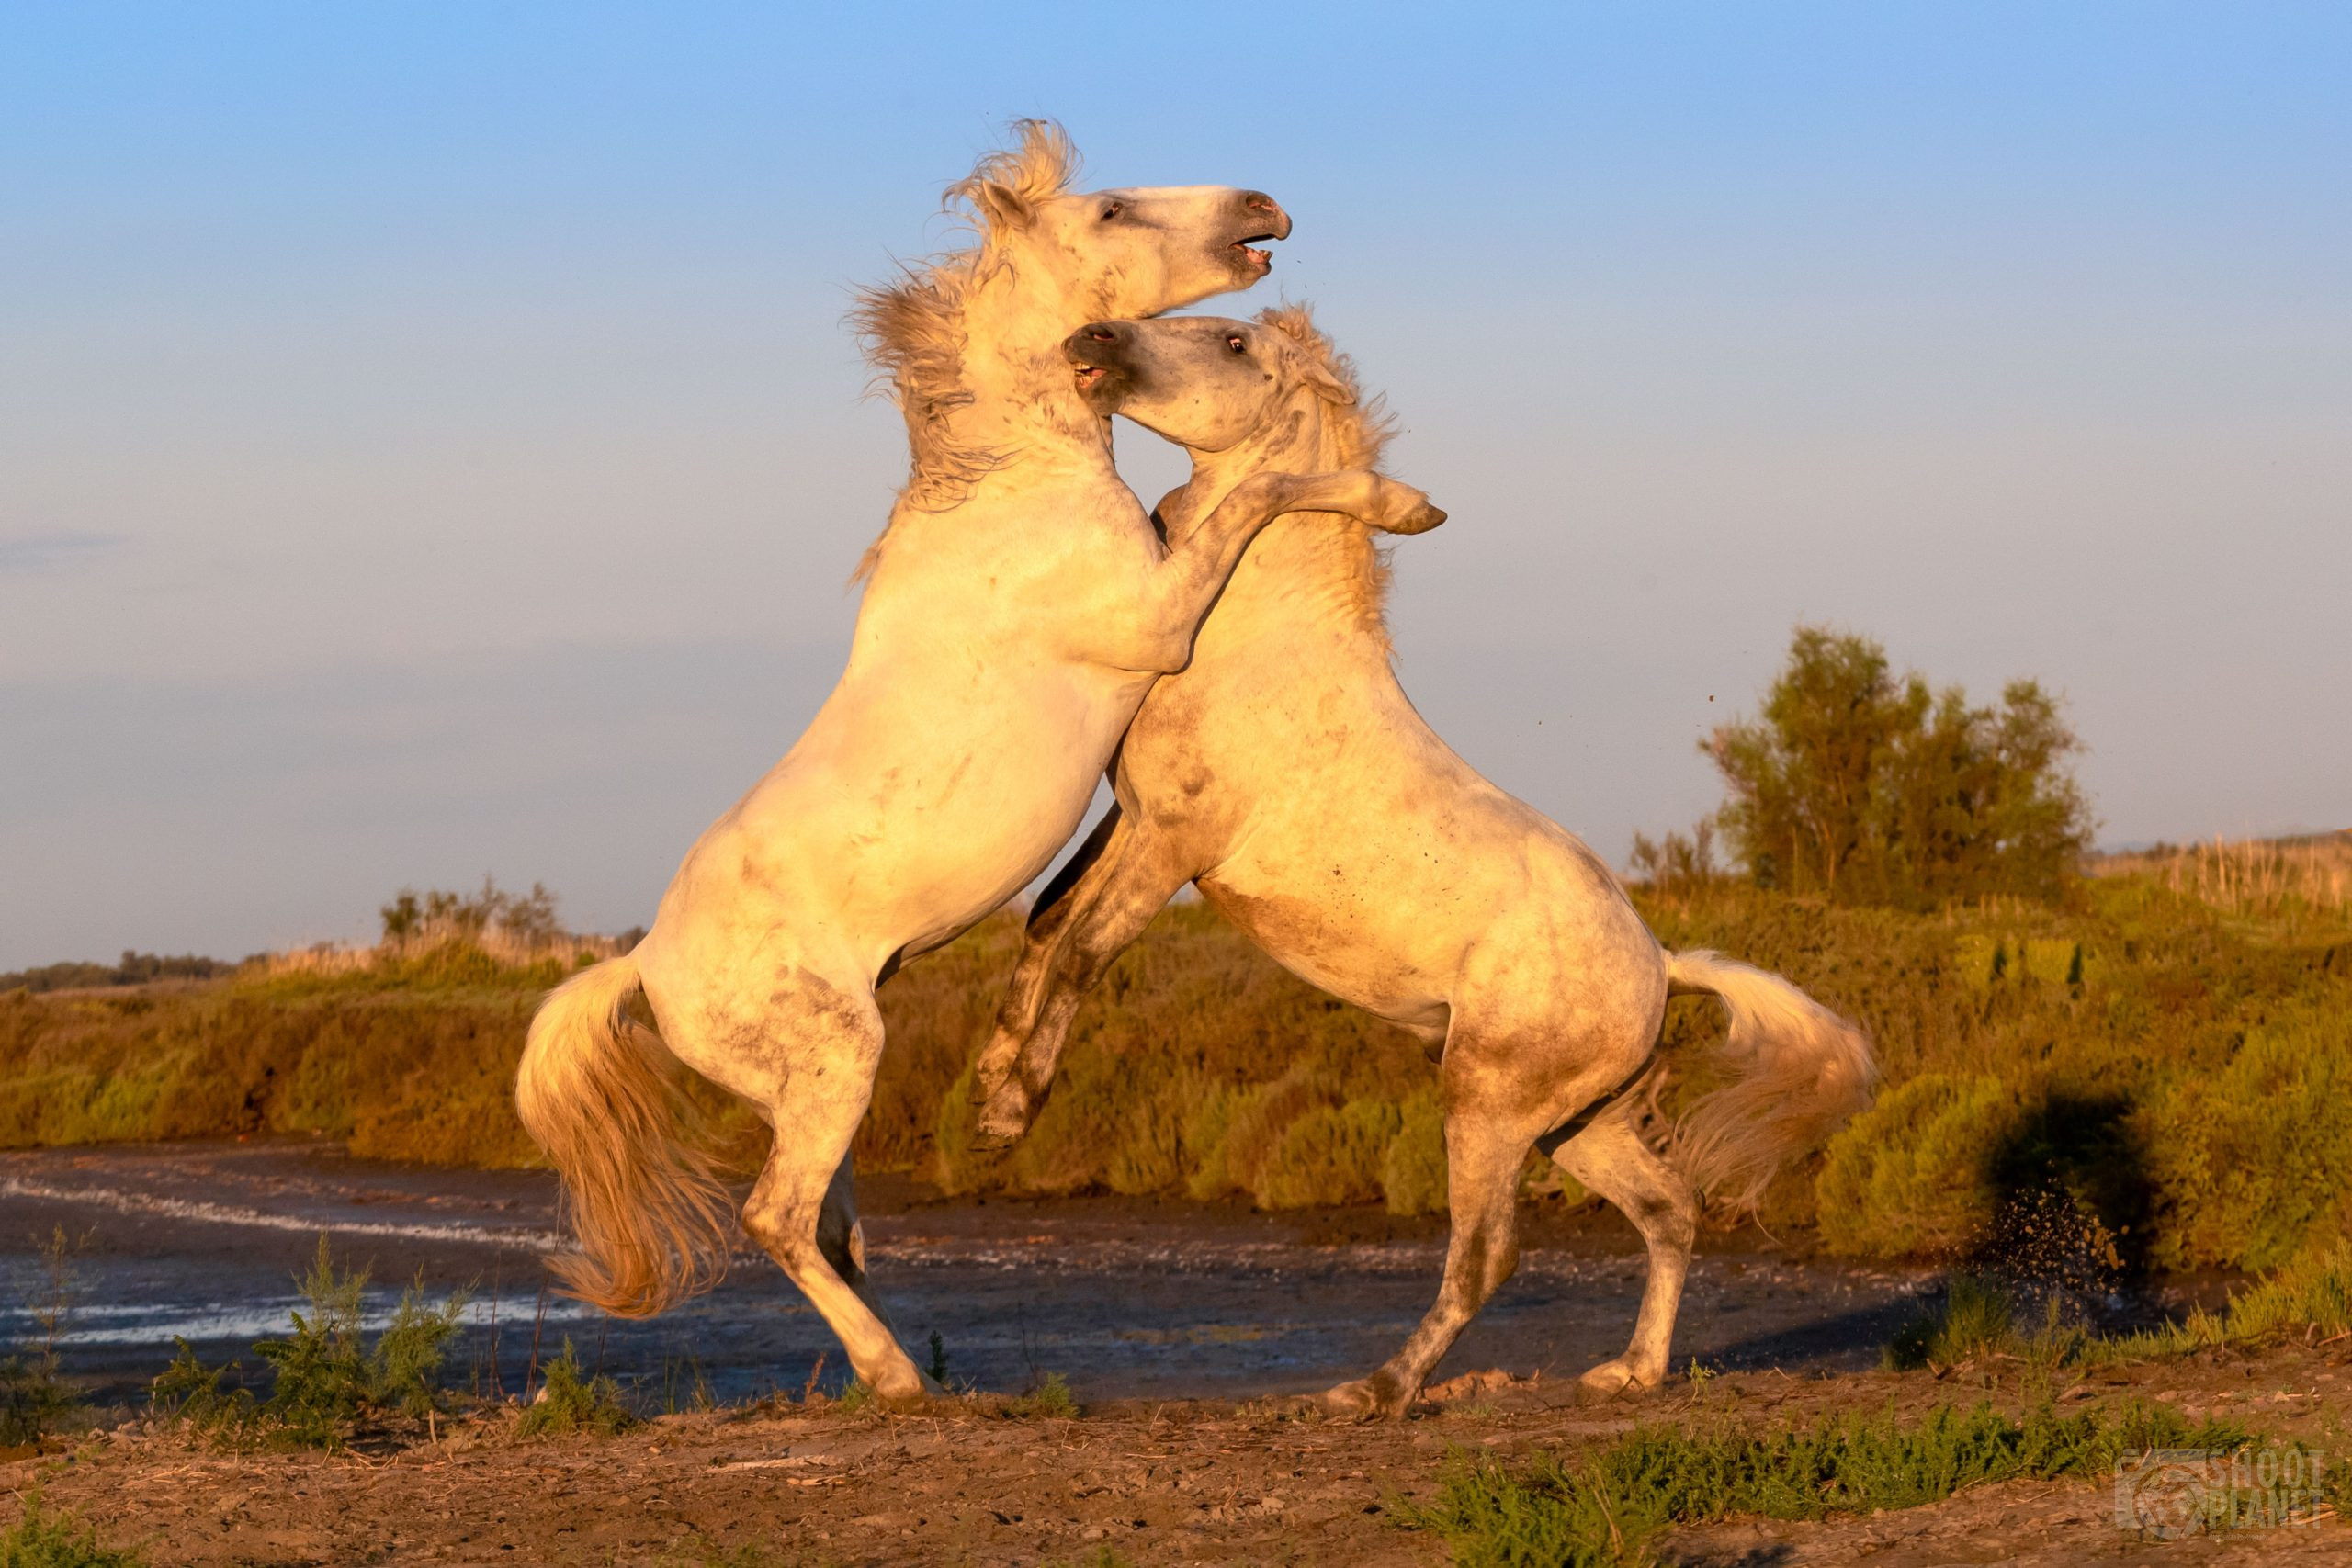 Stallions horses fighting at sunrise, Camargue France